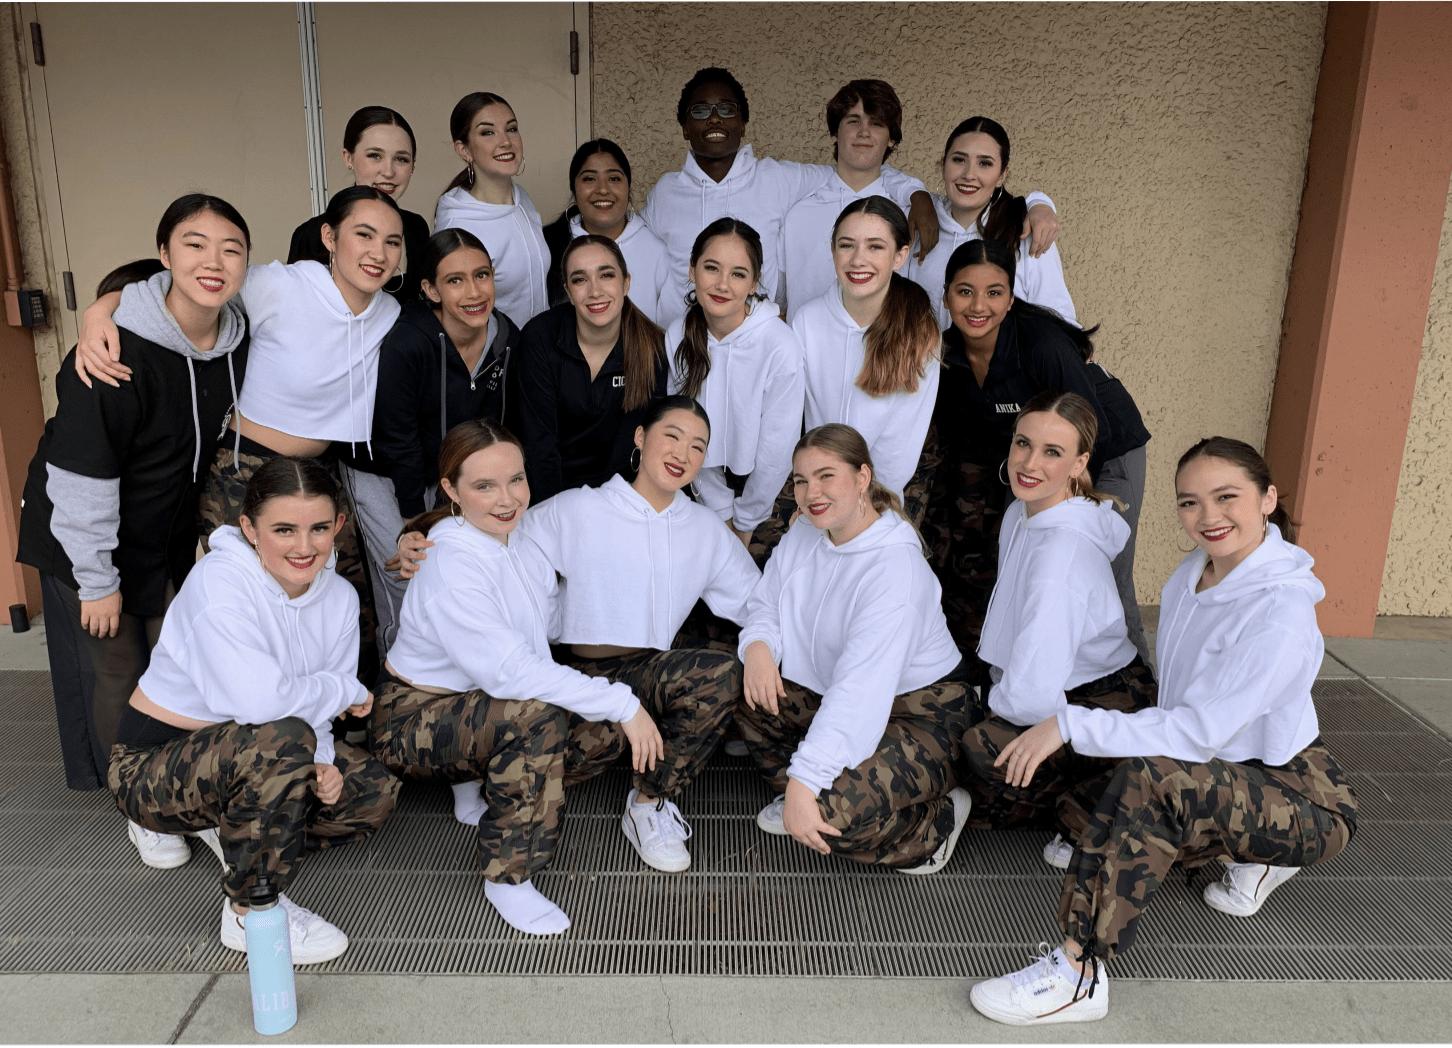 SHP's Hidden Gem: The Pulse Performance Team